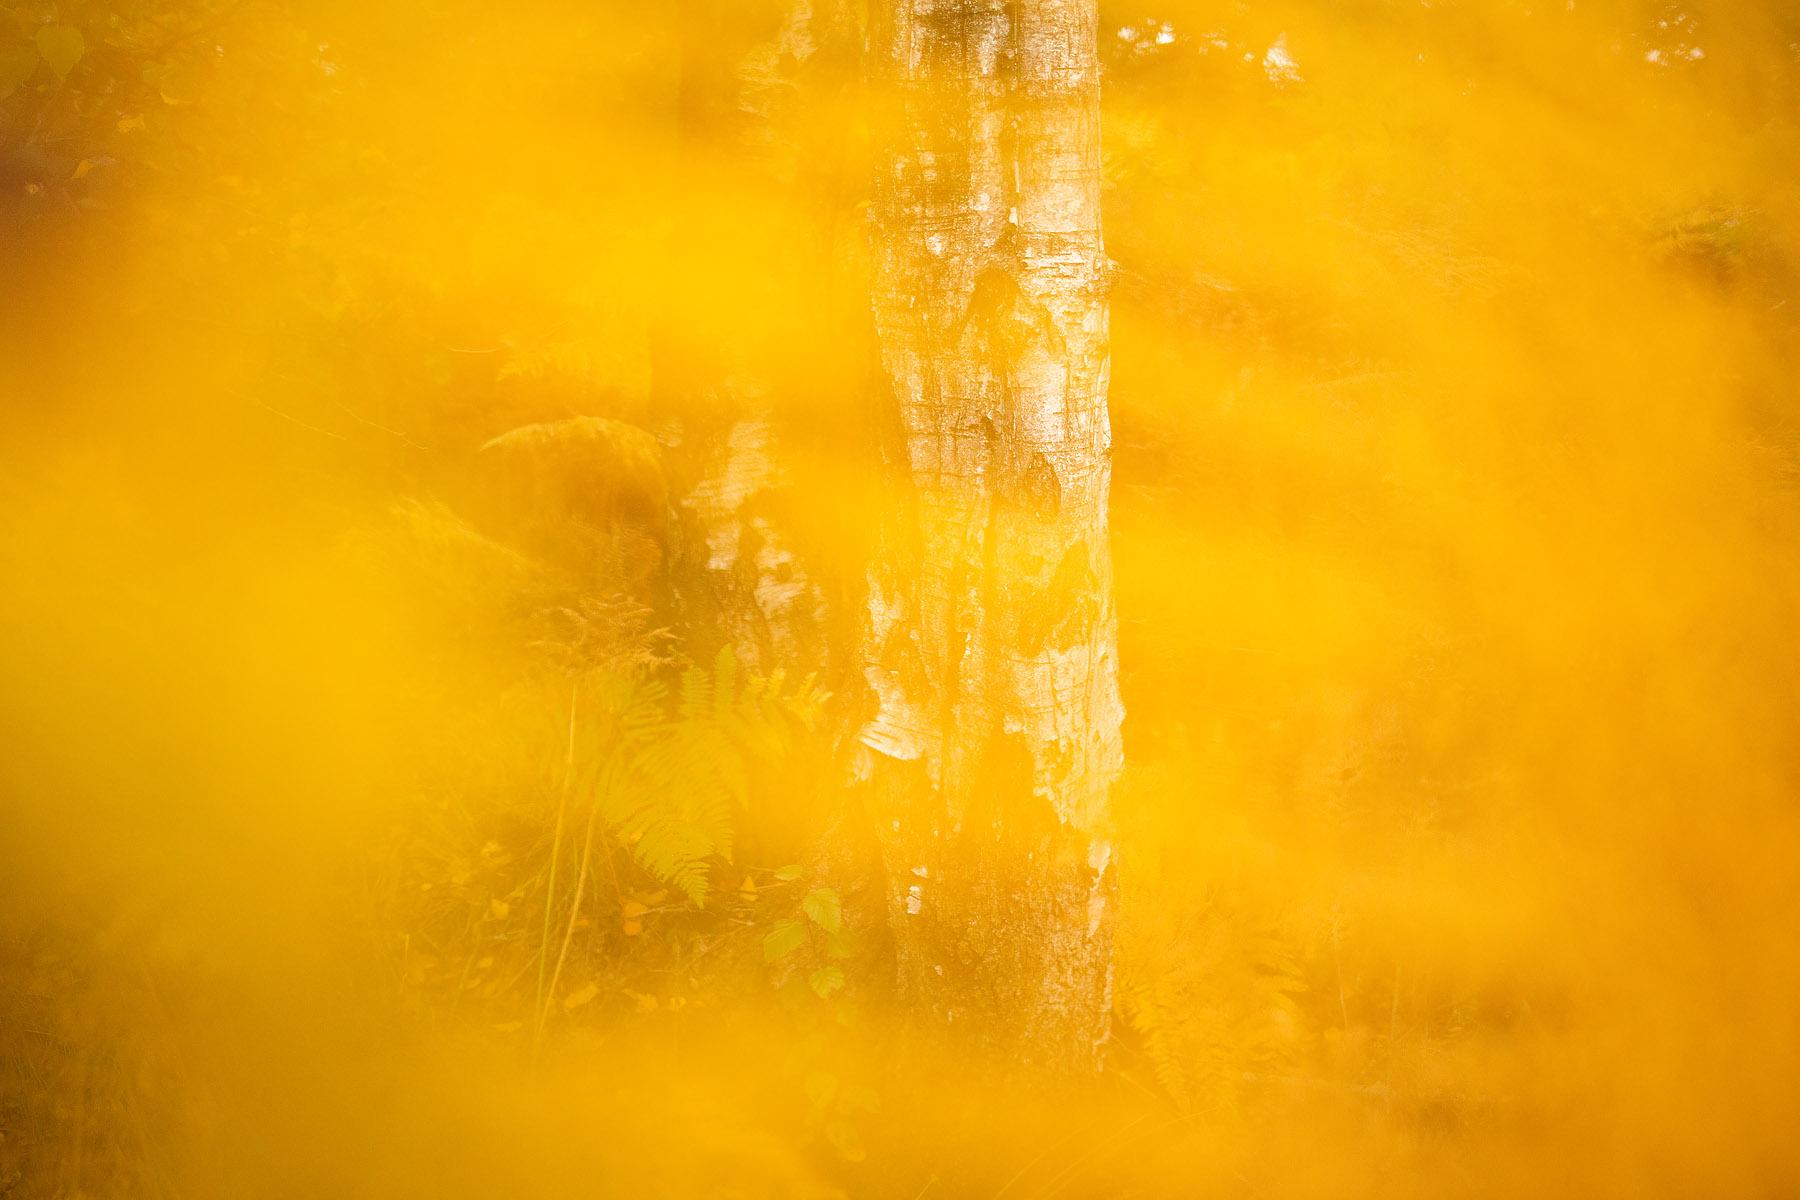 Varens, Hageven in Pelt (Neerpelt), West-Vlaamse landschapsfotograaf Glenn Vanderbekeen in Pelt (Neerpelt), West-Vlaamse landschapsfotograaf Glenn Vanderbeke